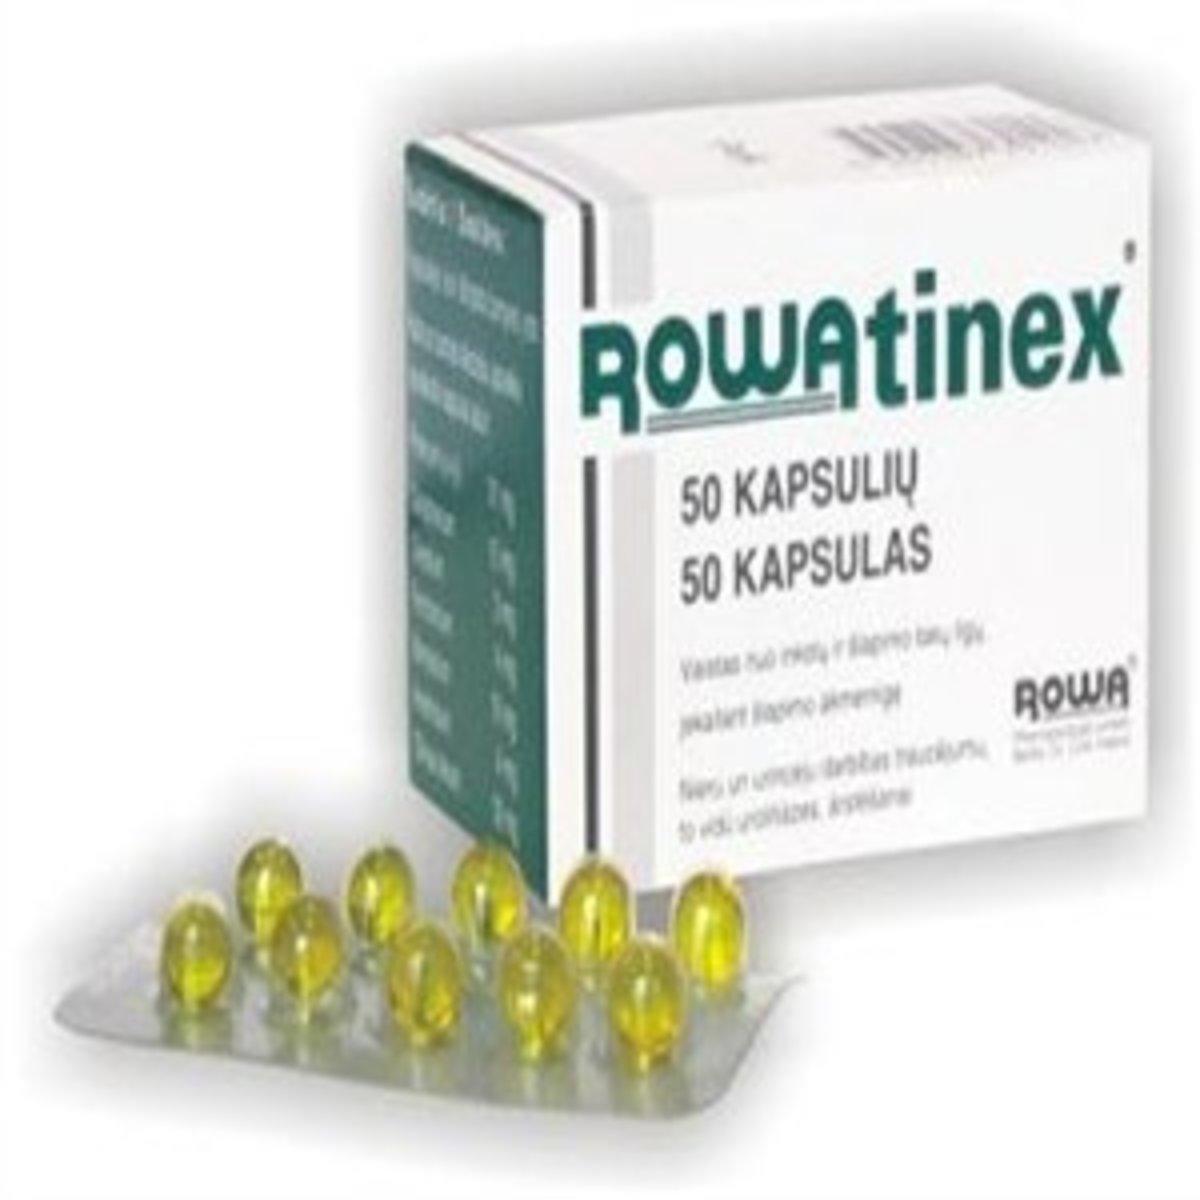 Rowatinex Capsule